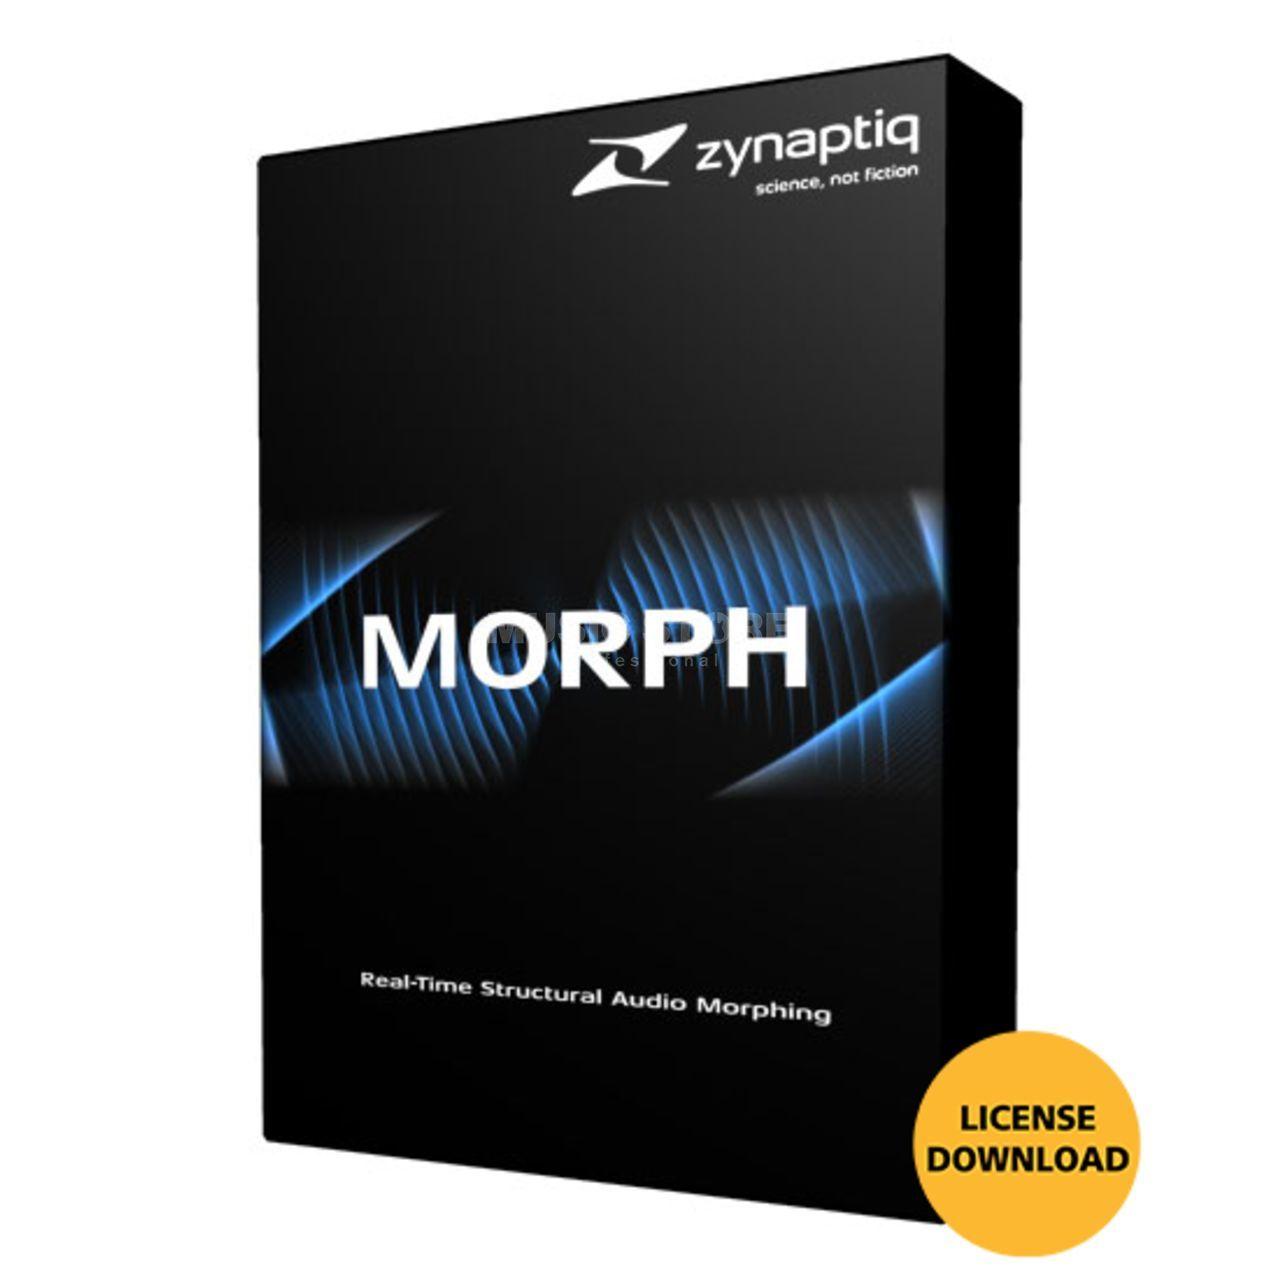 Zynaptiq Morph